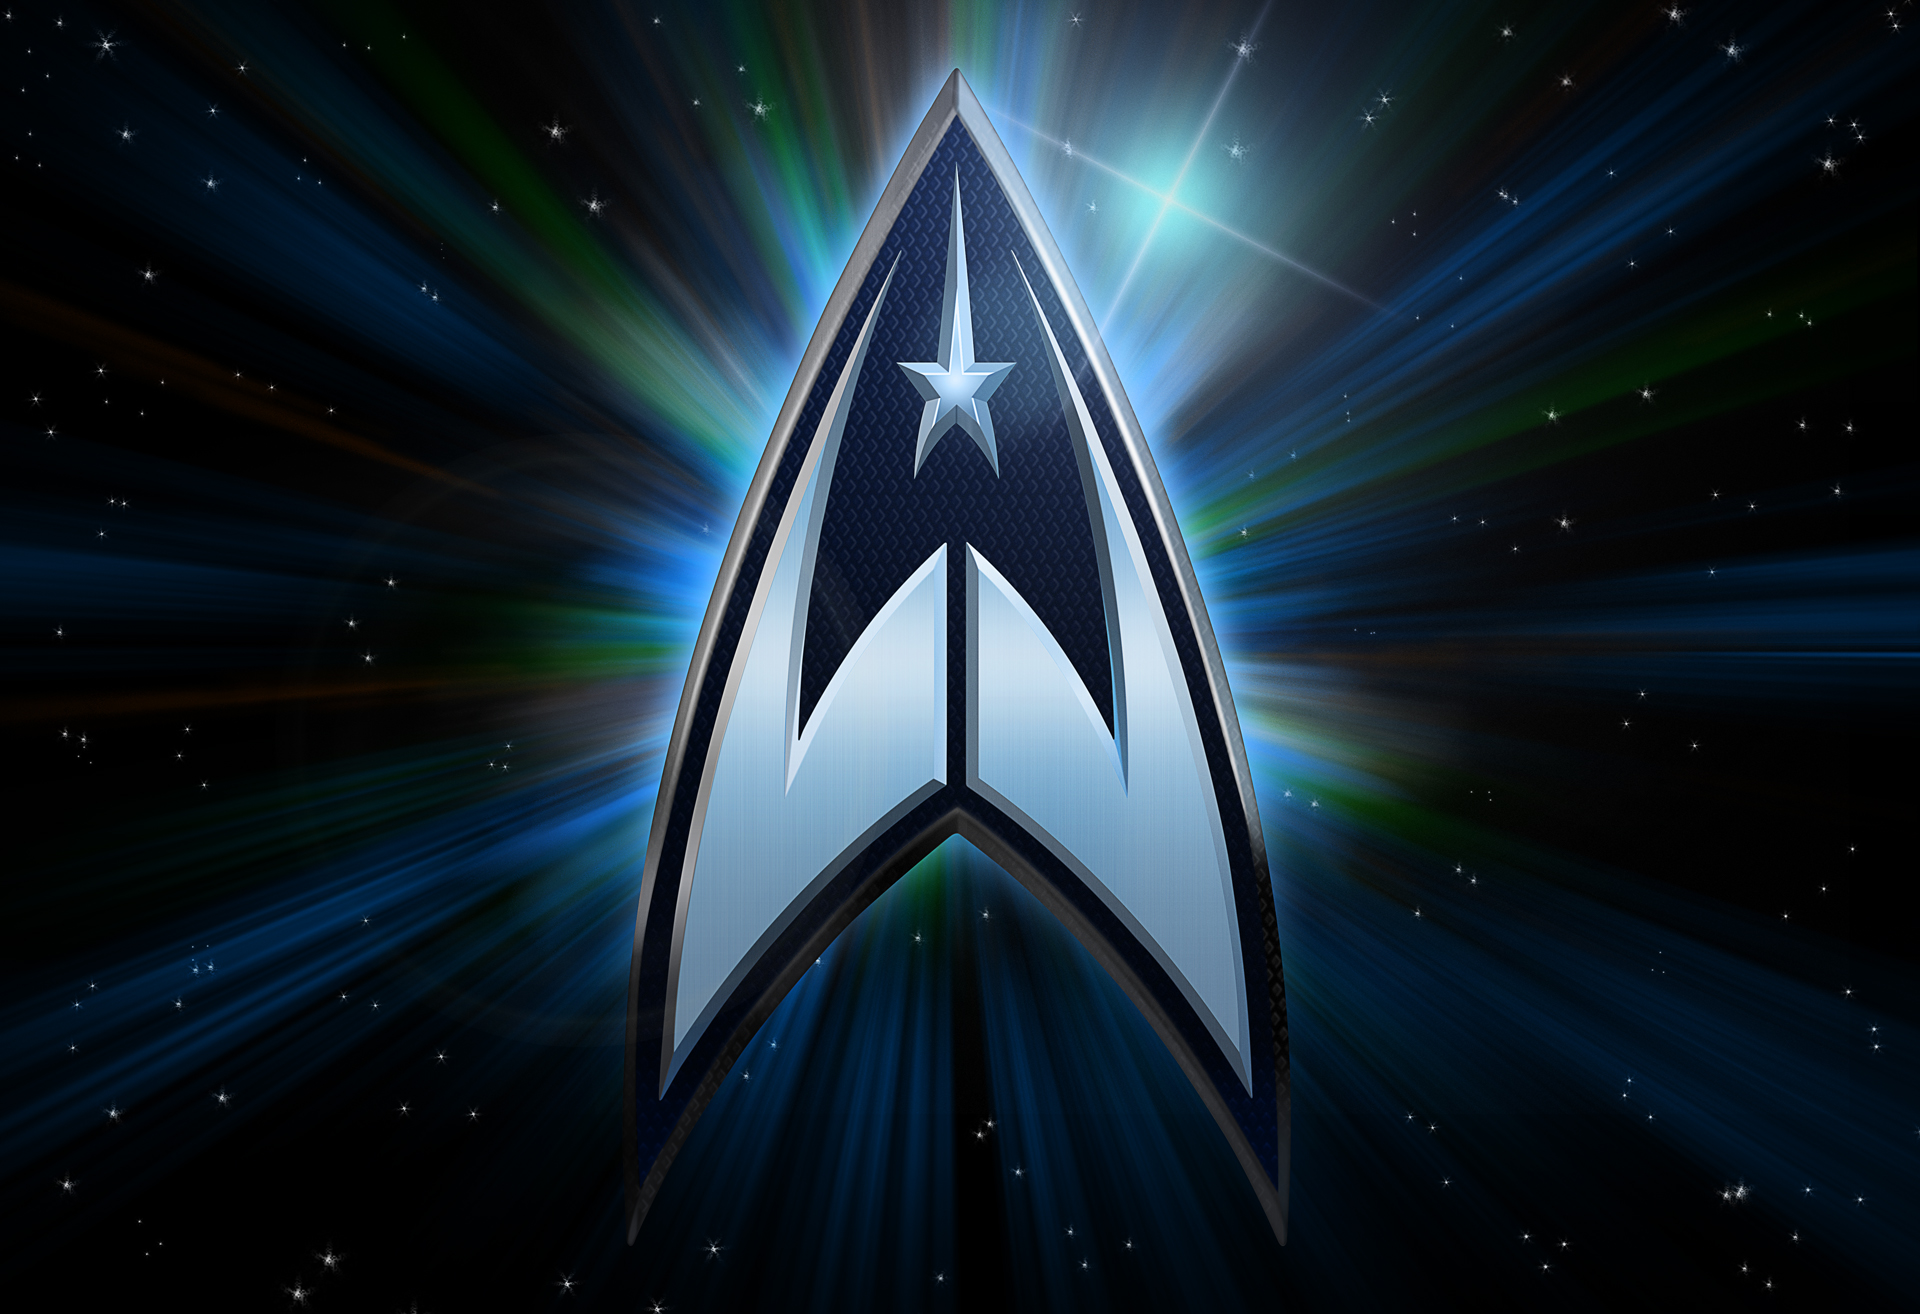 Trek emblem wallpaper by retoucher07030 on deviantart - Star trek symbol wallpaper ...